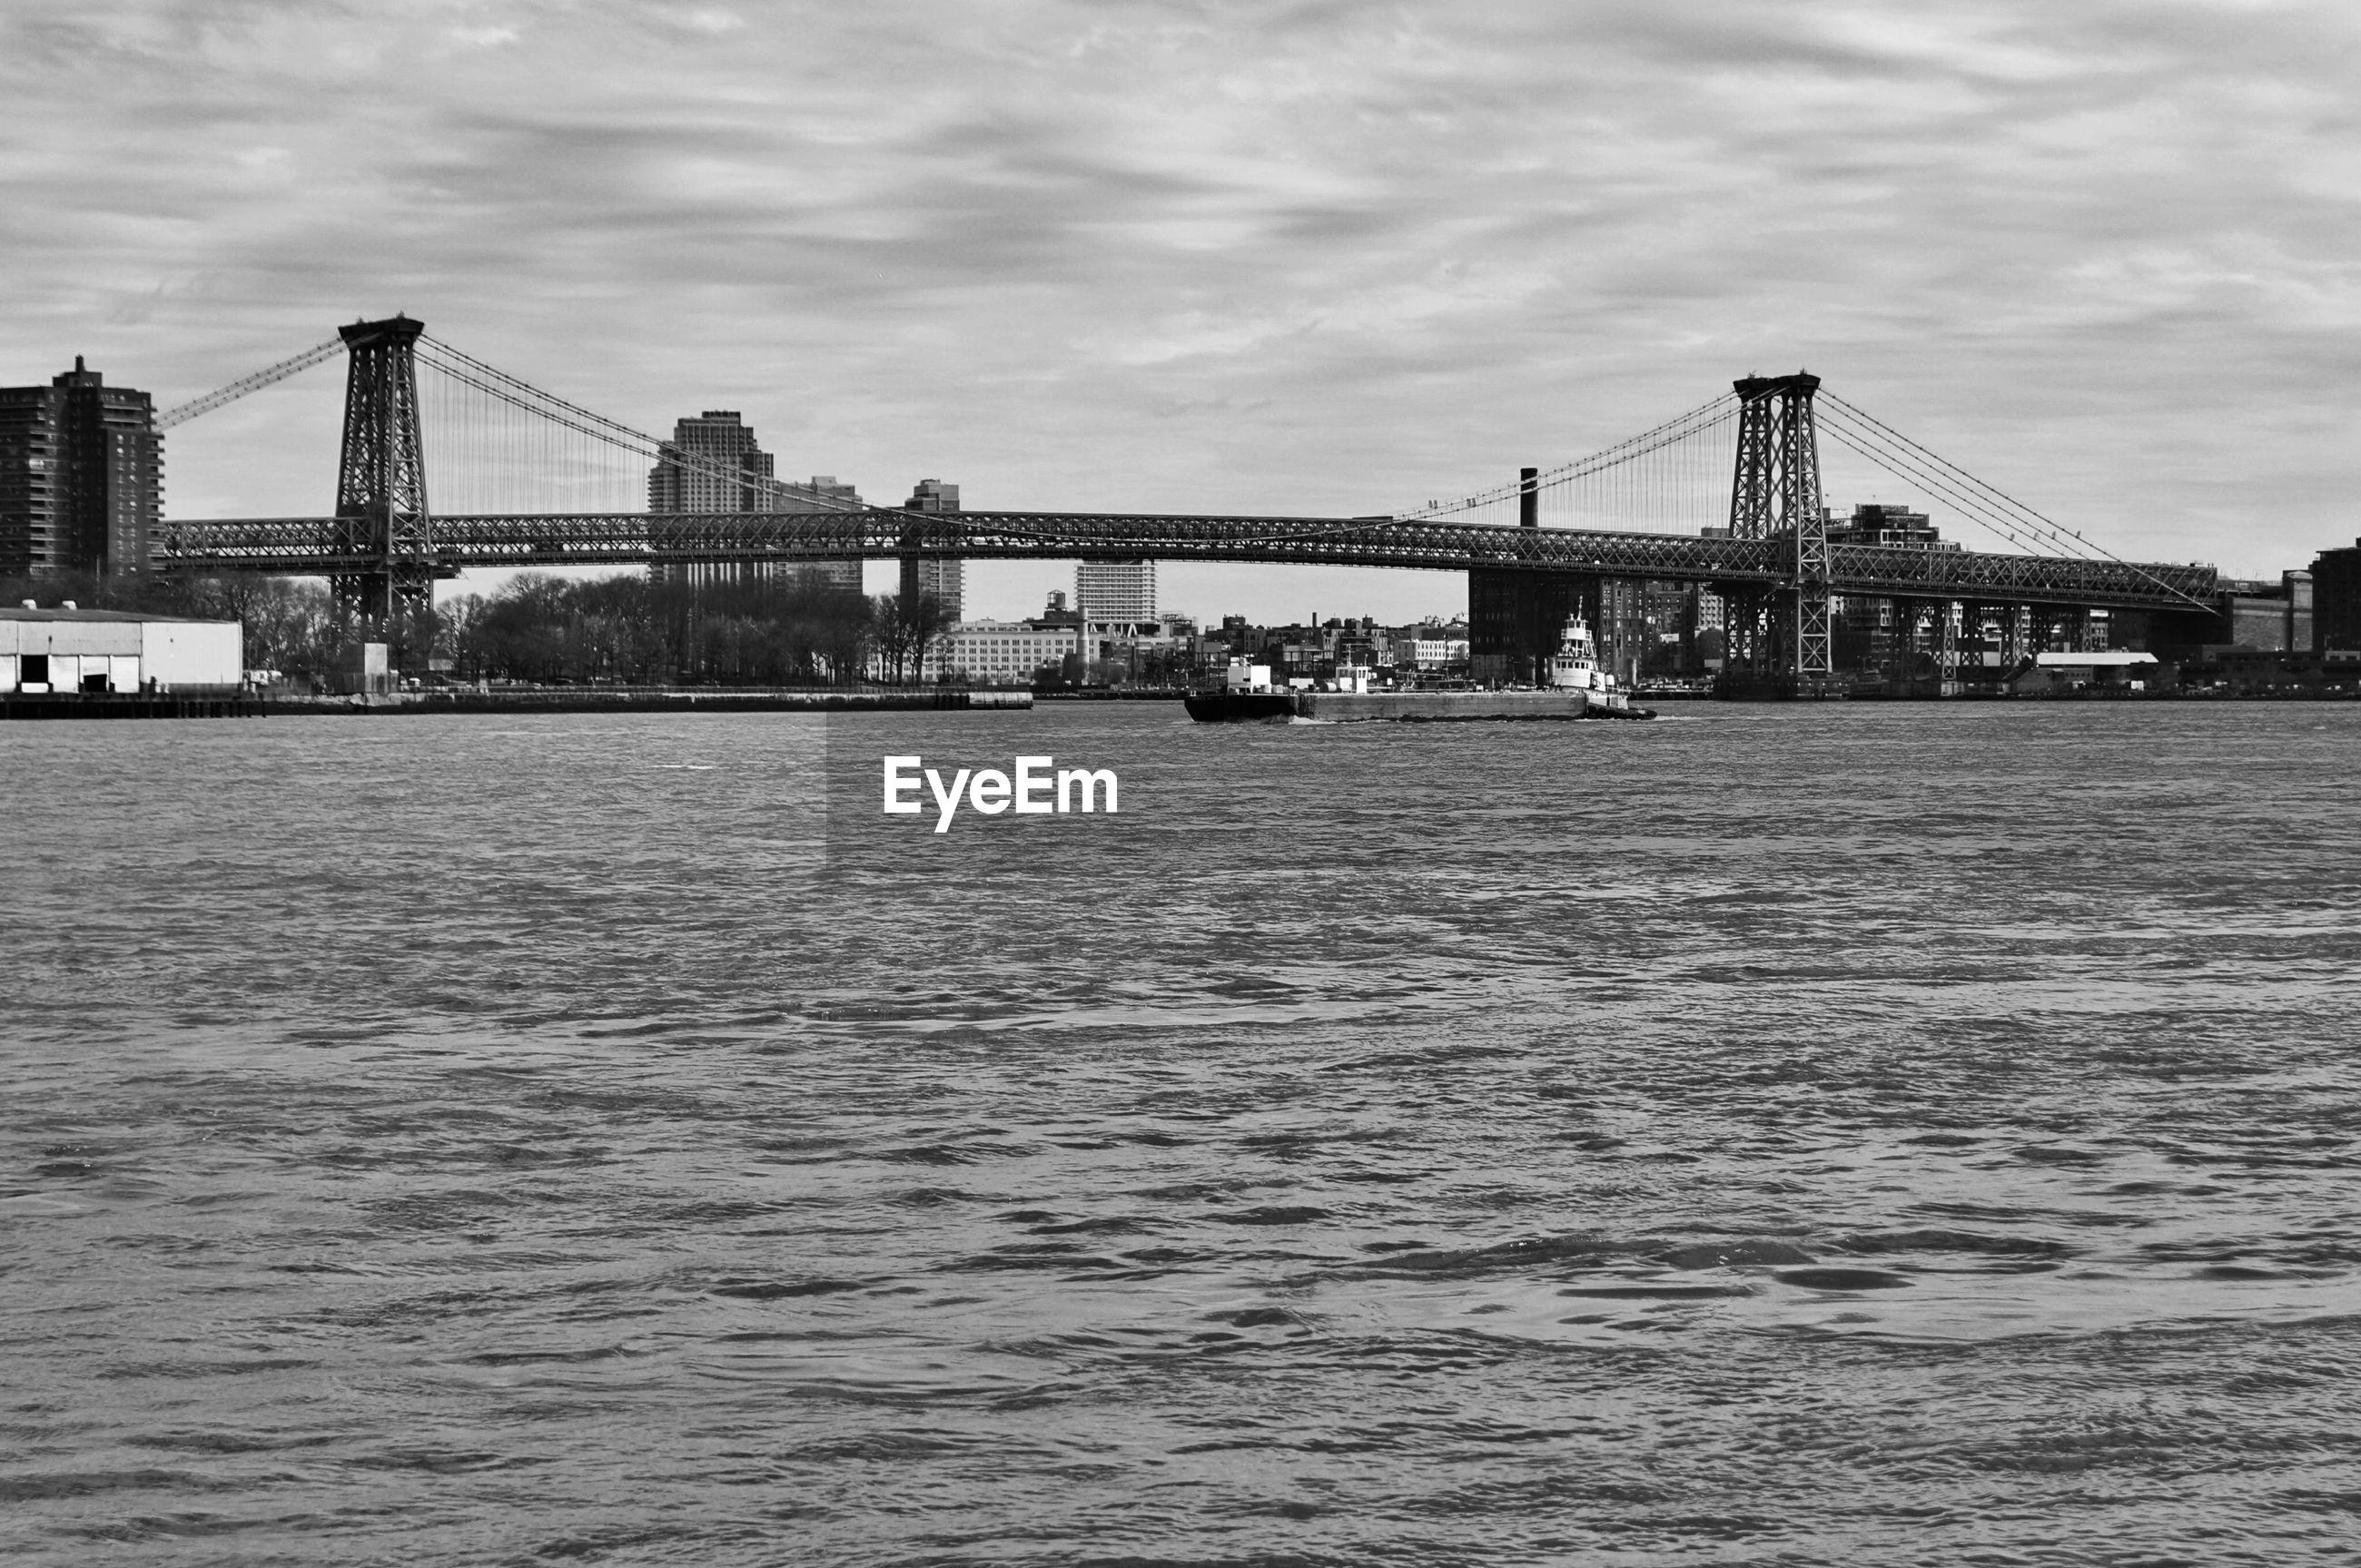 VIEW OF BRIDGE ACROSS RIVER